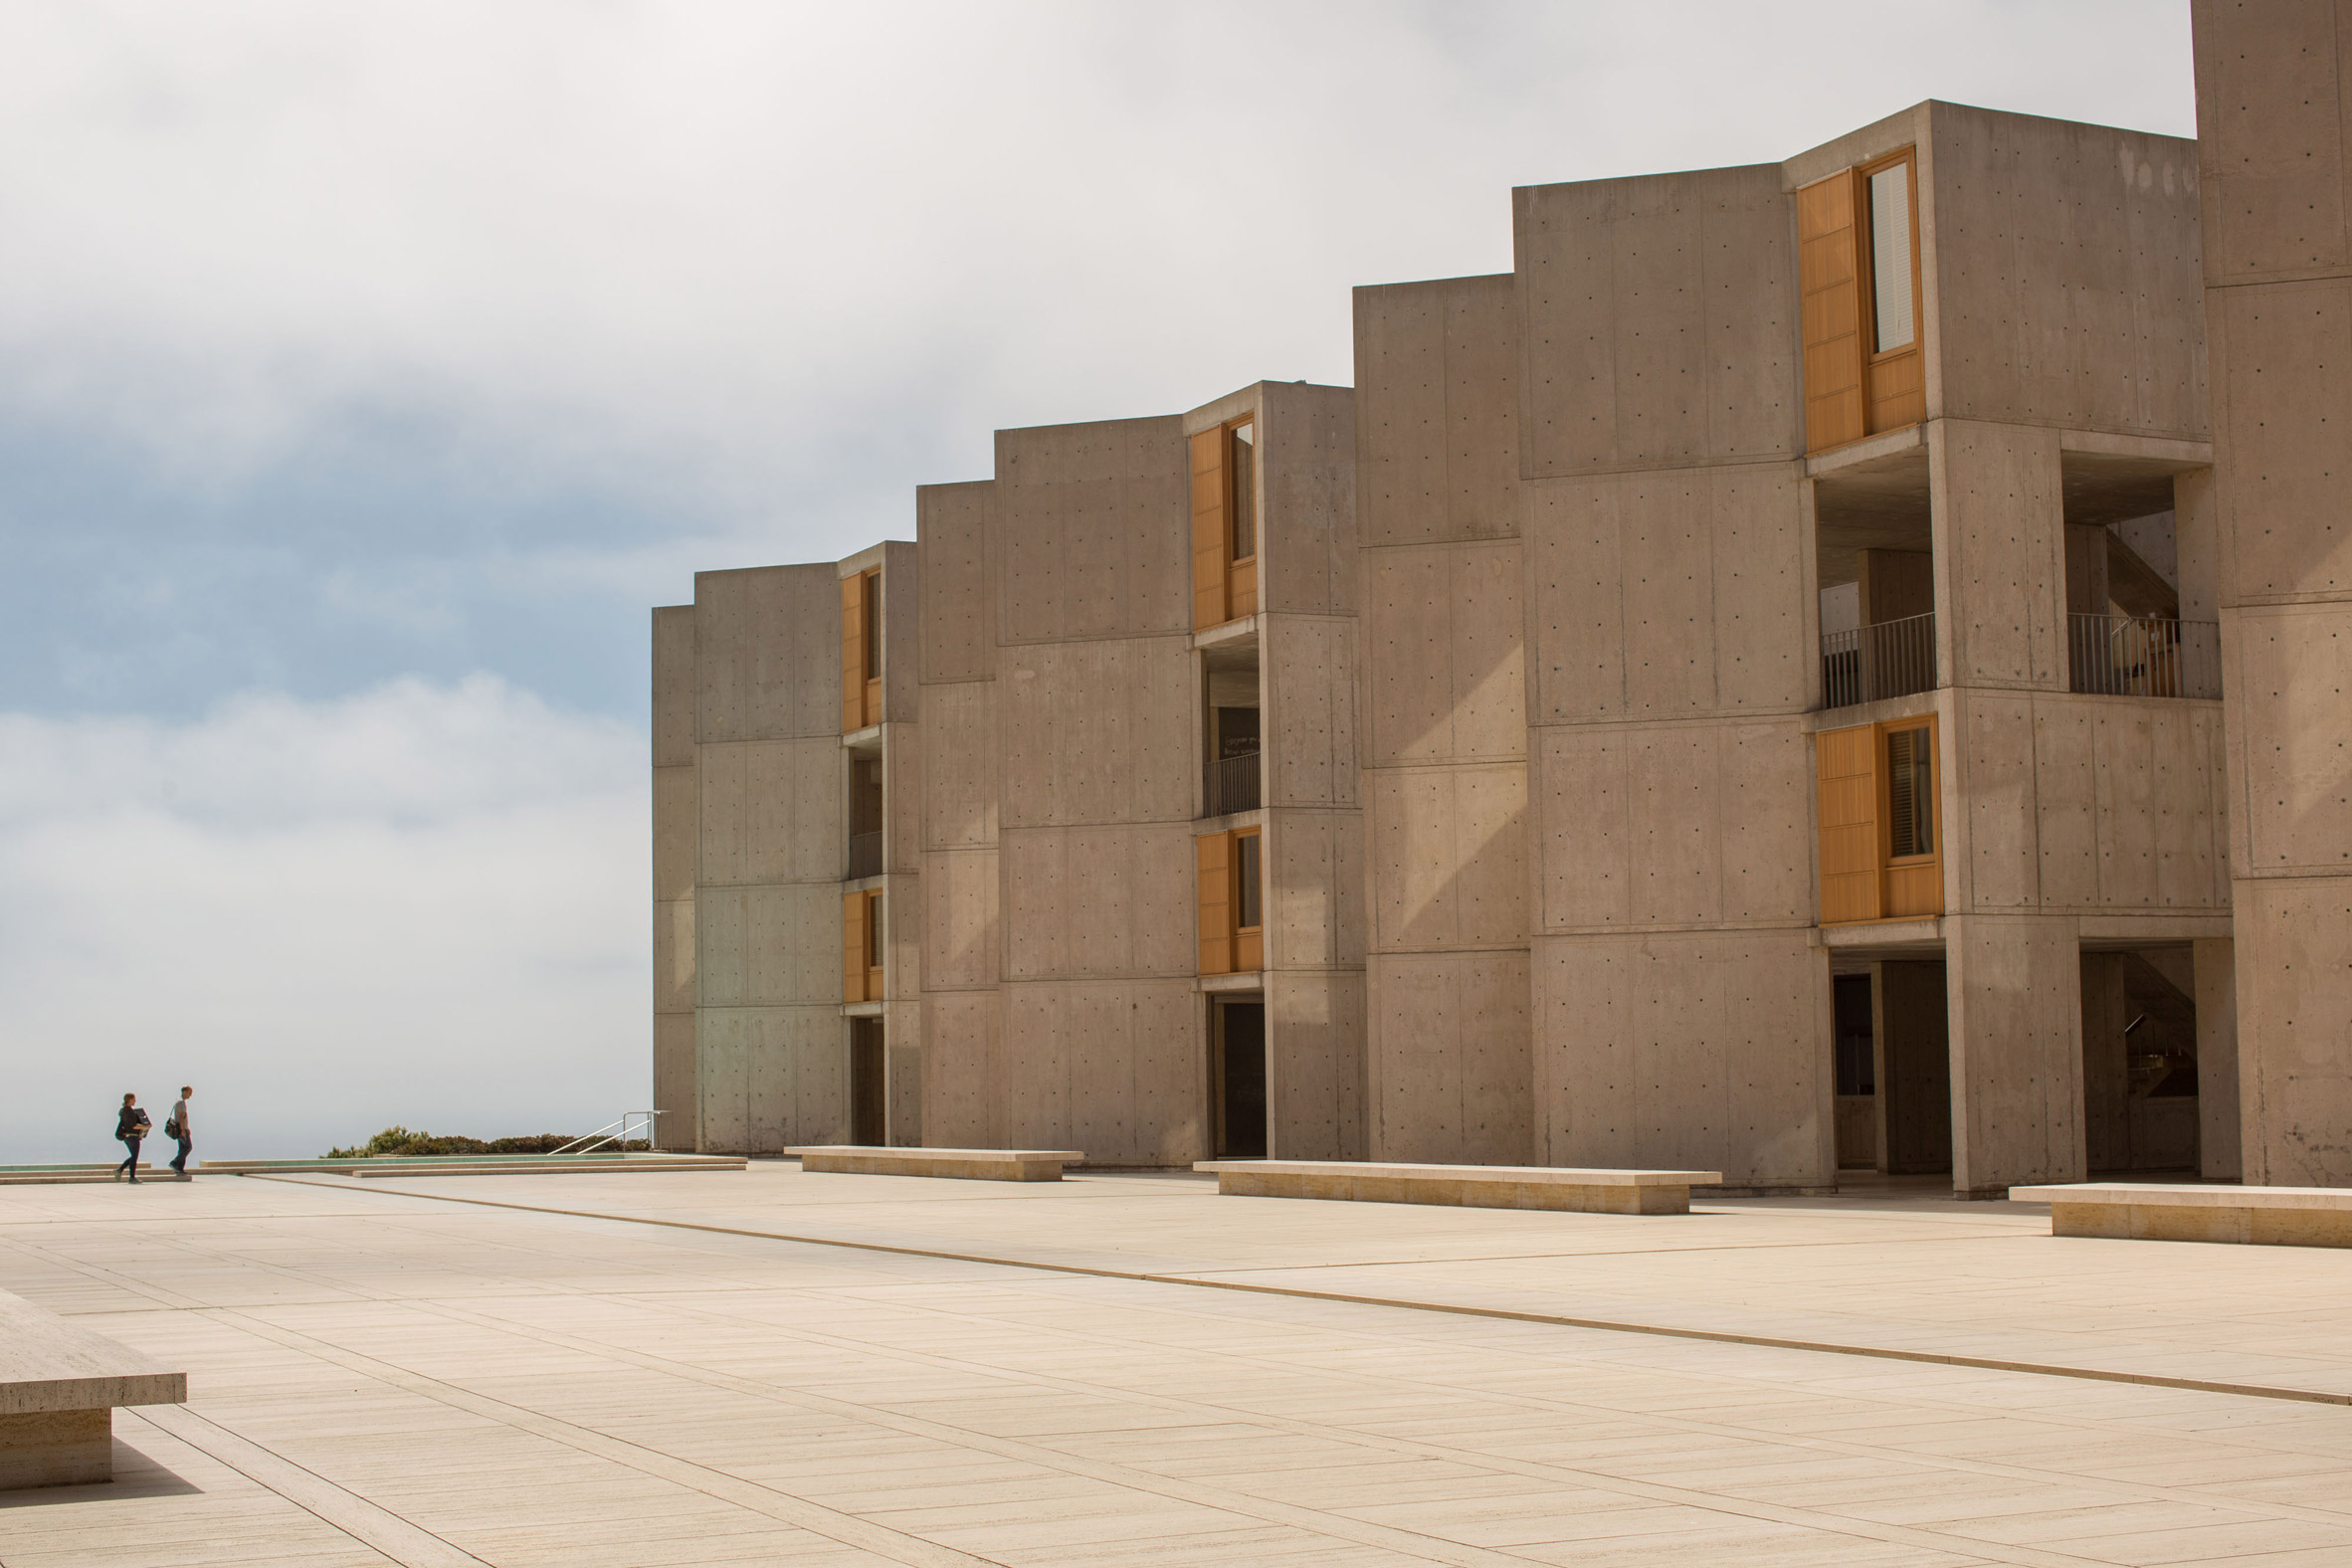 Restoration work completes on Louis Khan's Salk Institute in California